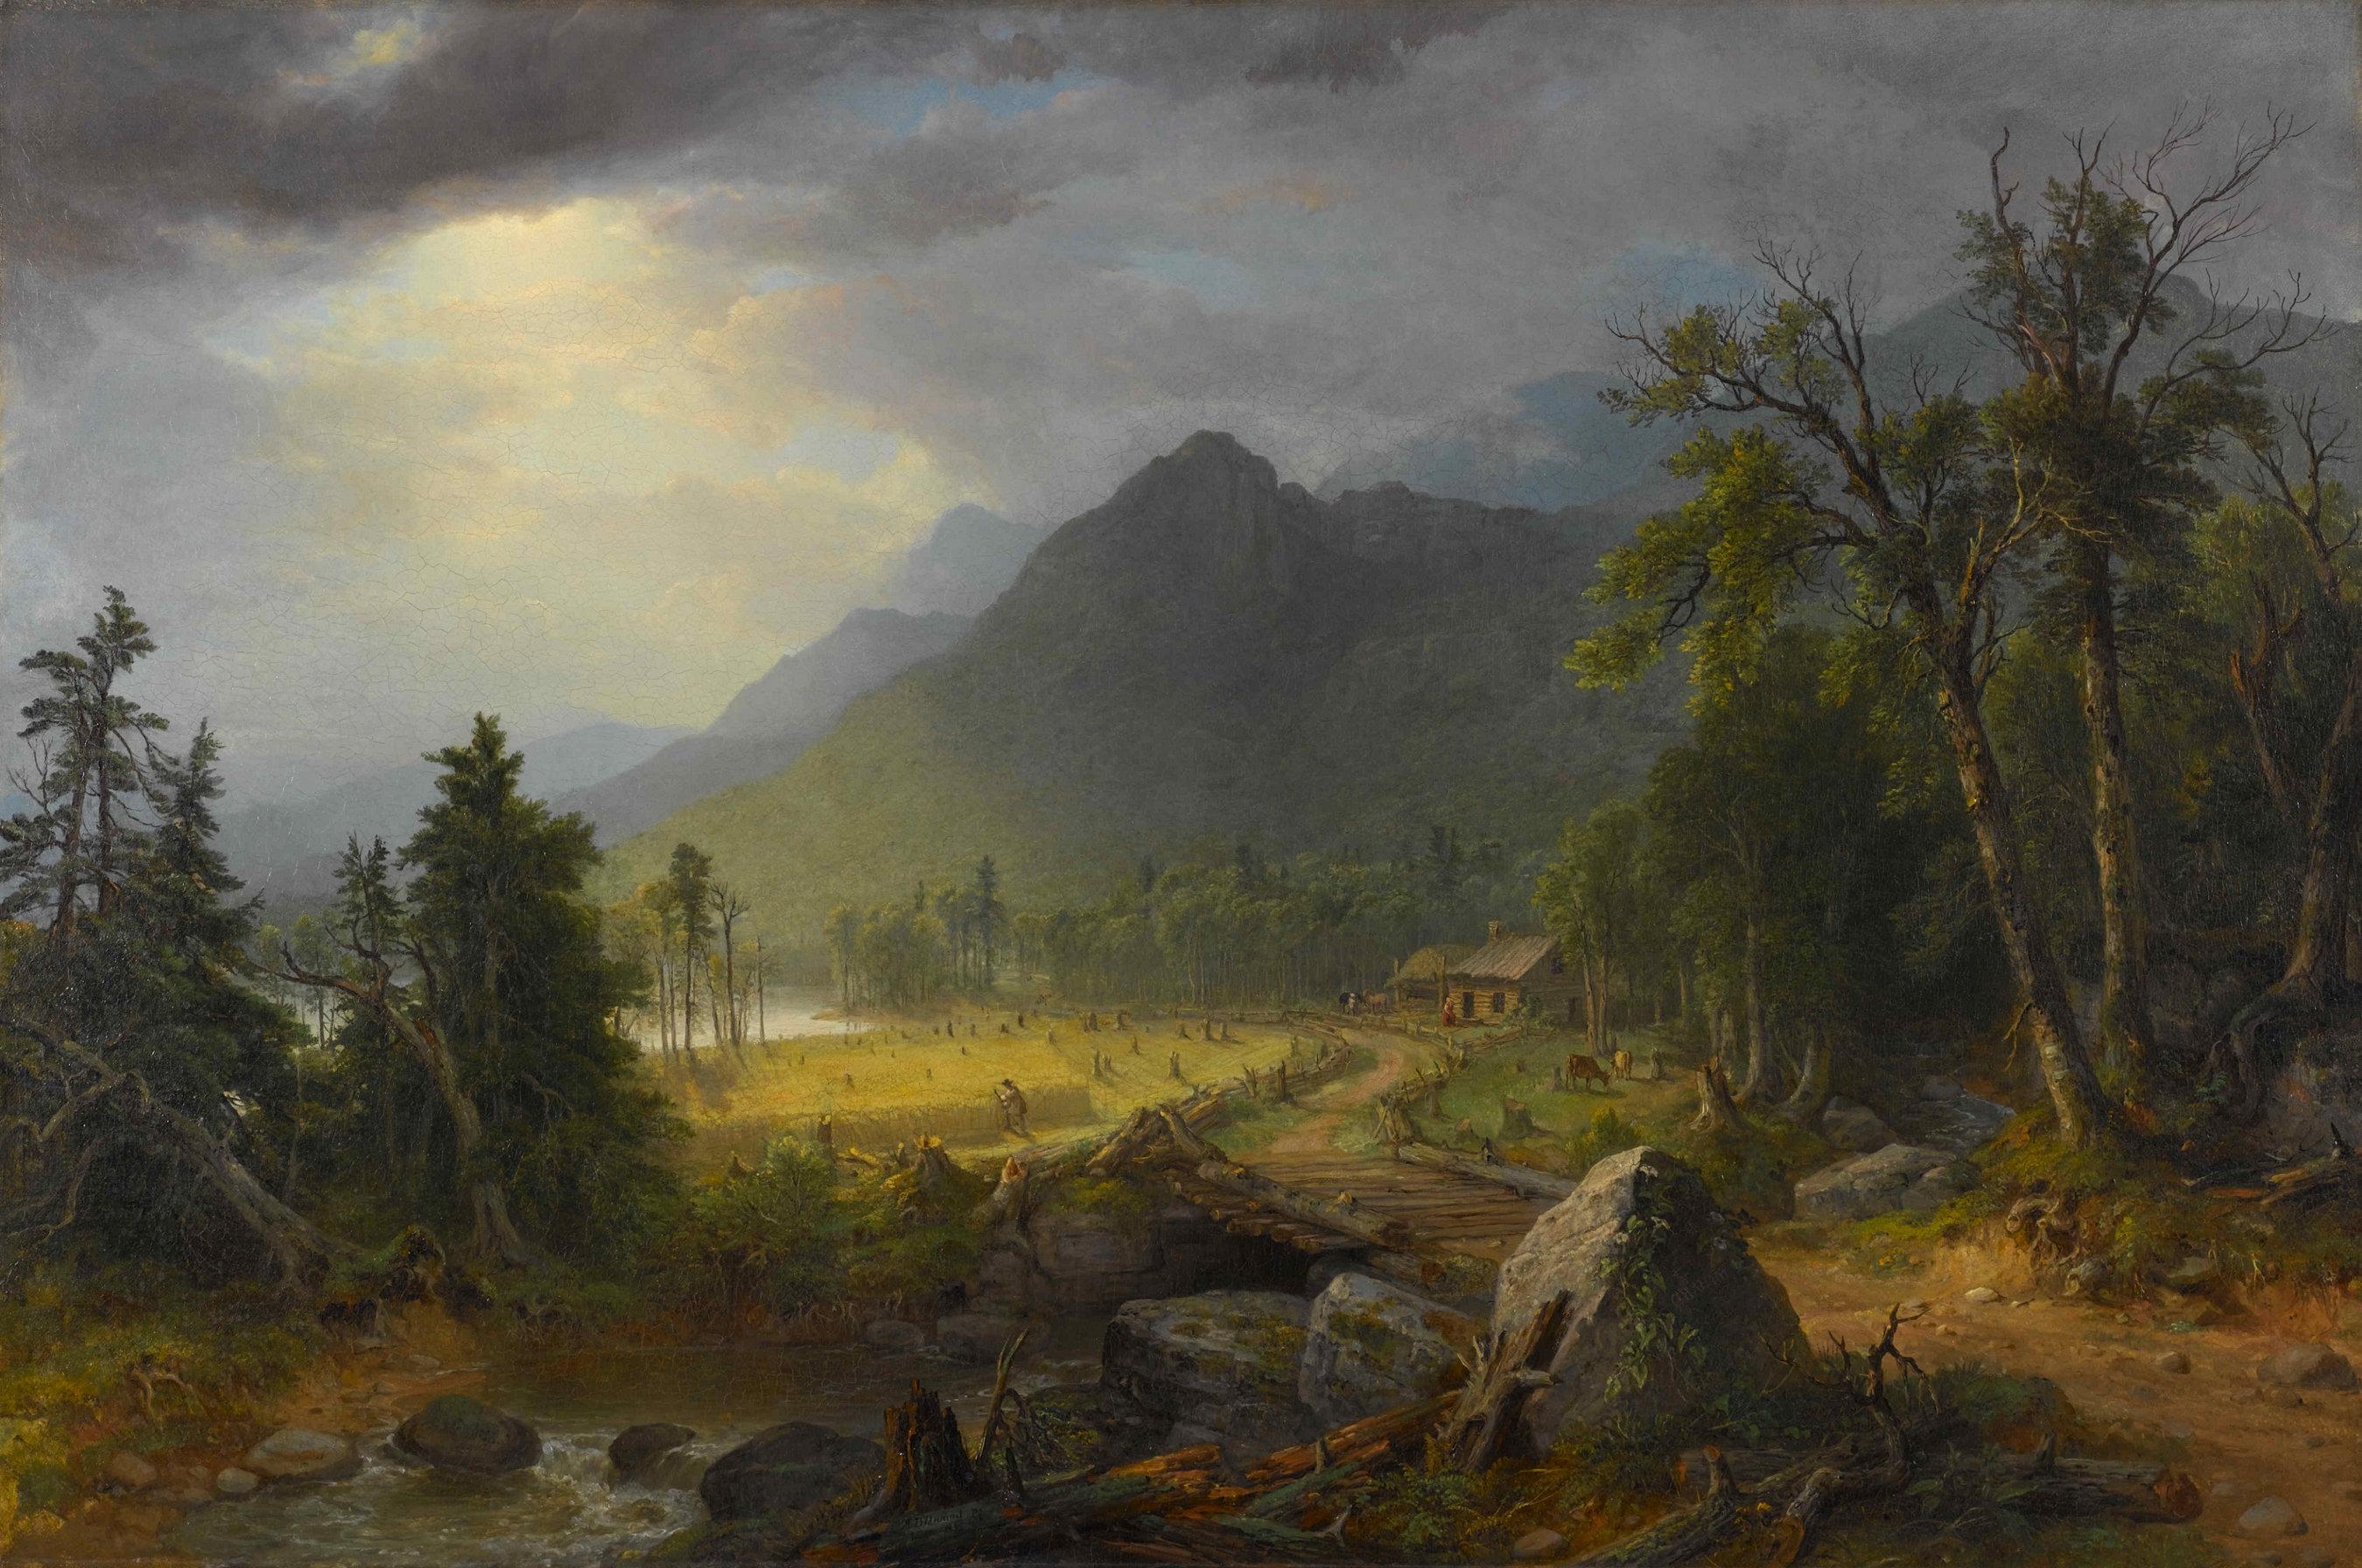 Gambar Pemandangan Hutan Gurun Gunung Langit Kabut